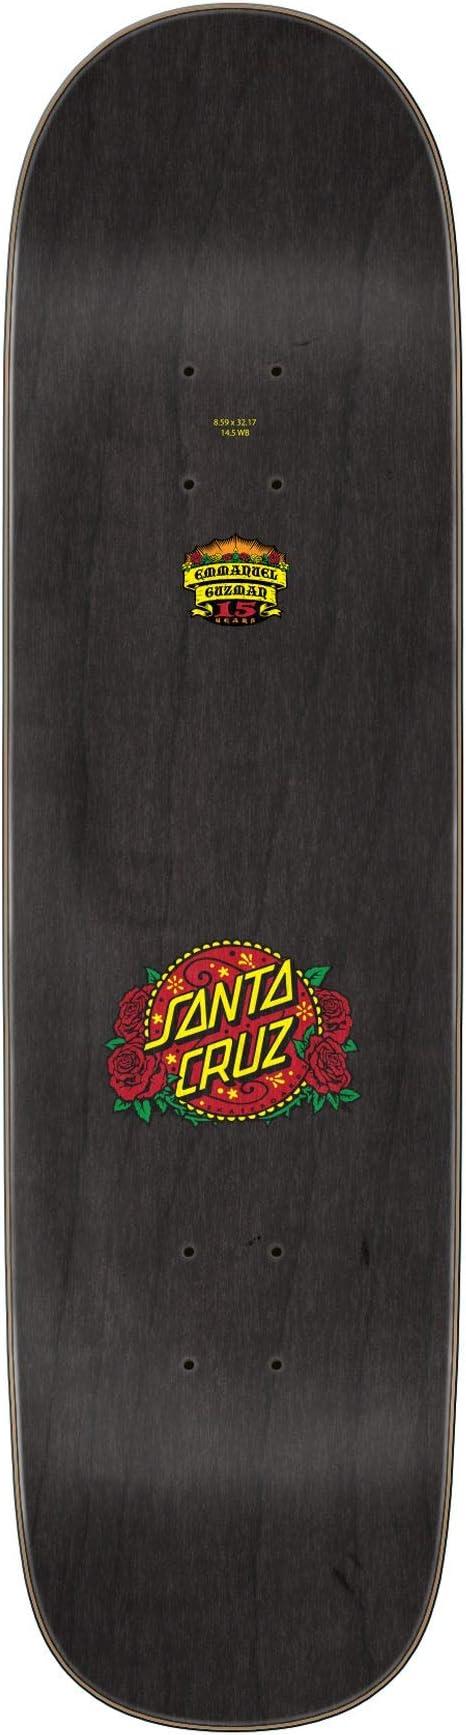 SANTA CRUZ Tabla Skateboards Dressen Dine with Me 8.59